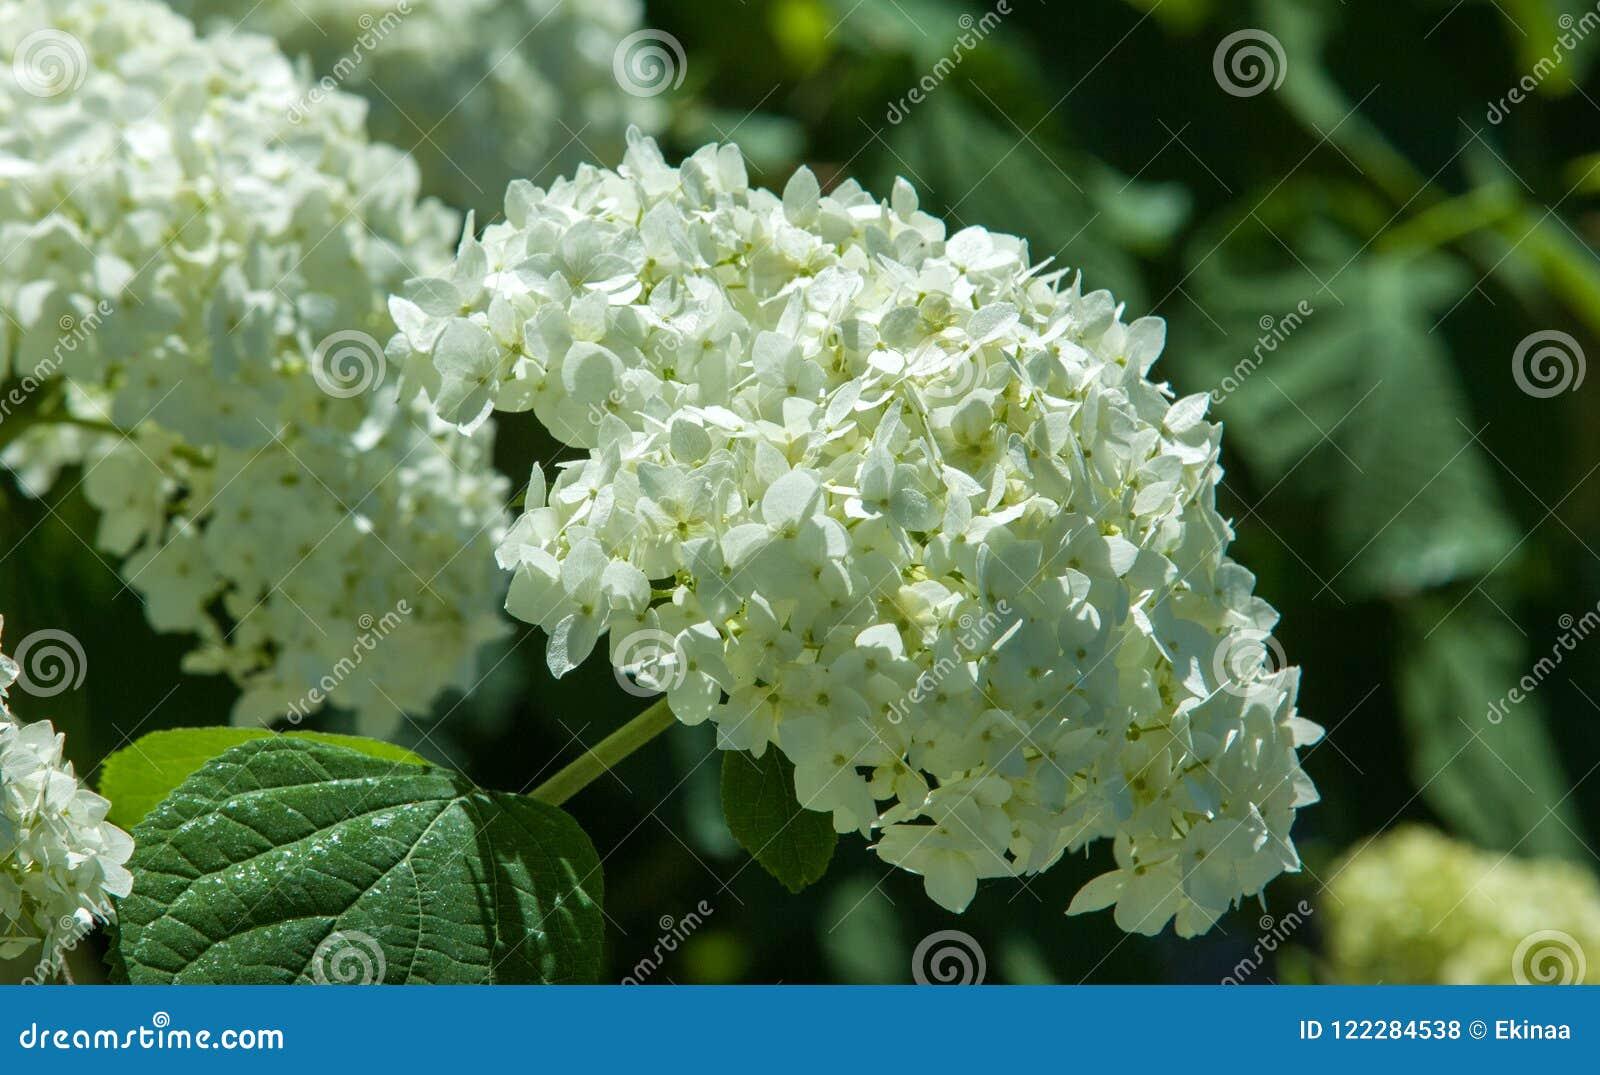 Decorative Bush Viburnum Or Buldonezh Stock Photo Image Of Black